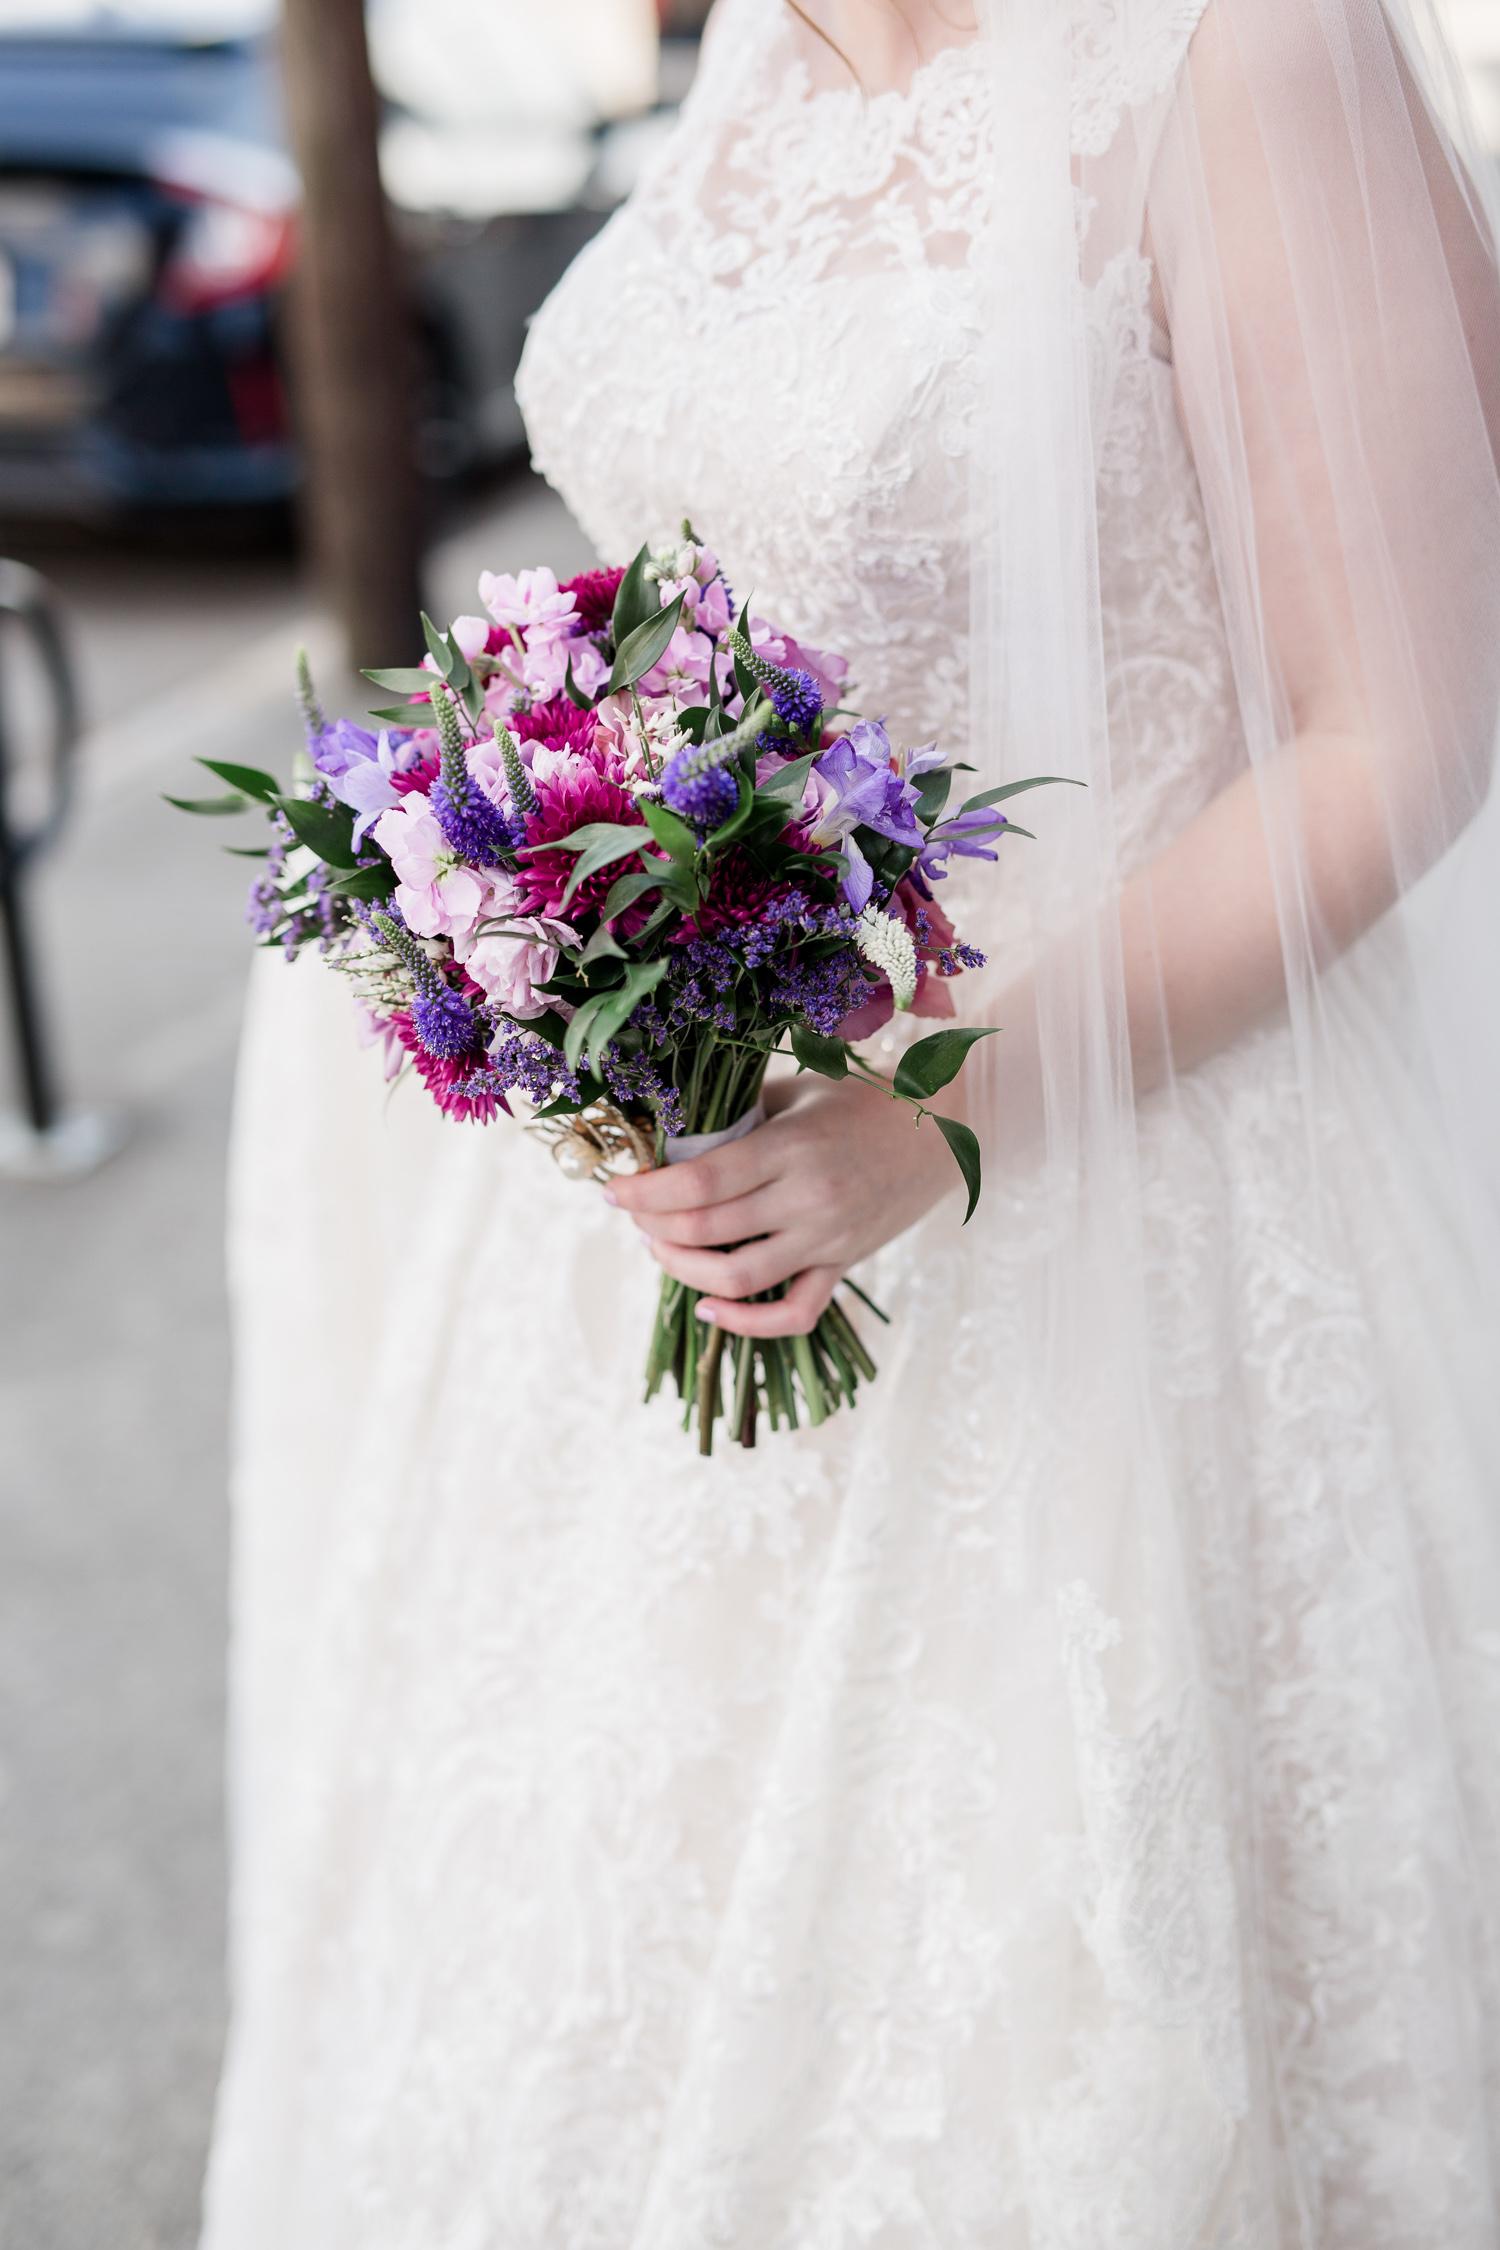 Downtown Knoxville Wedding Venue // Central Avenue Reception // Bridesmaids // Relix Knoxville Floral Design